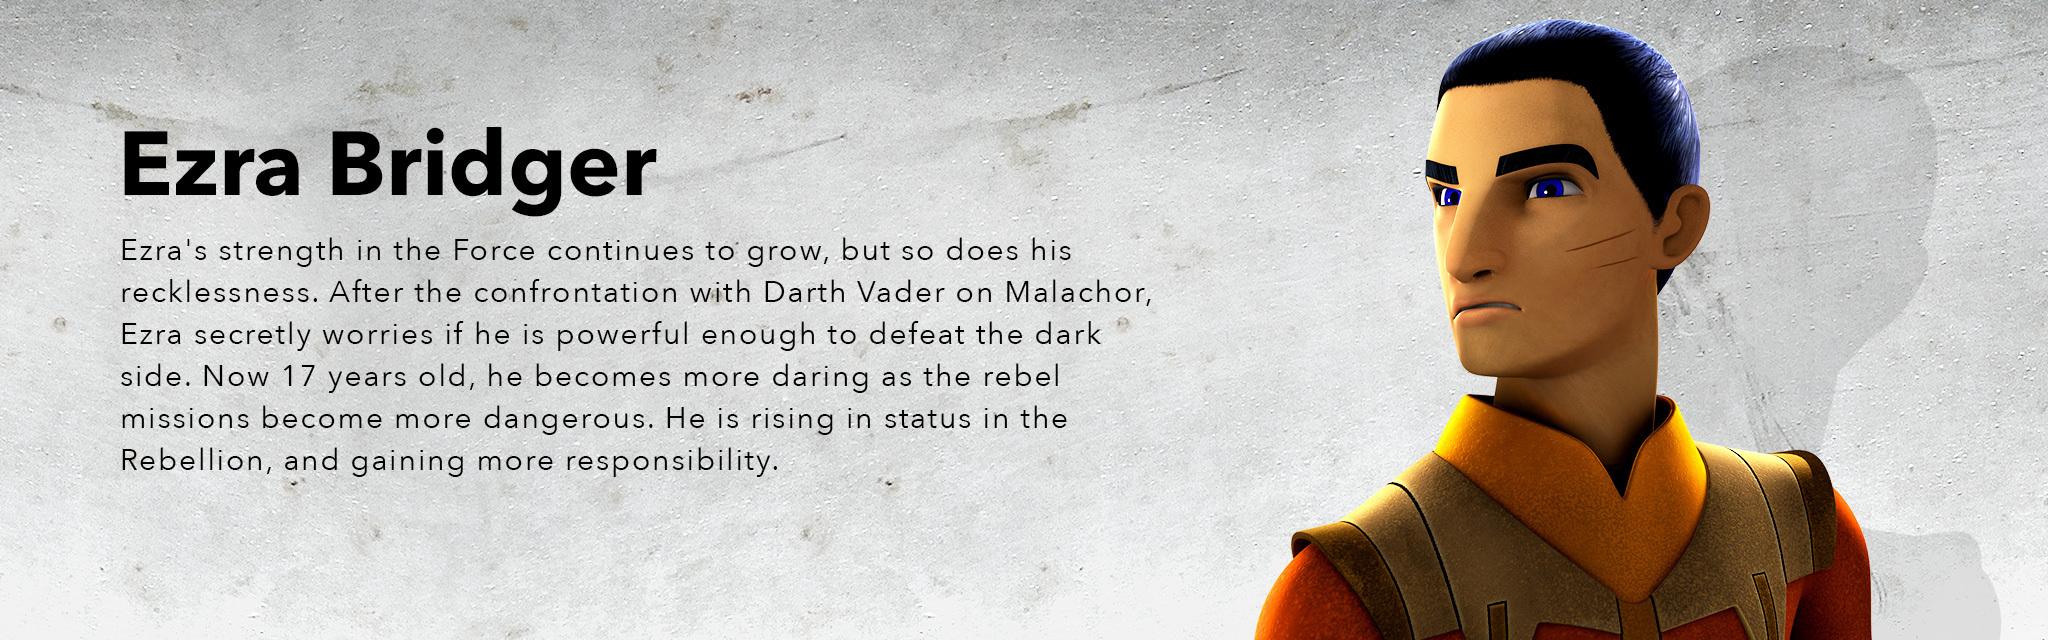 Star Wars Rebels Season 3 Ezra Bridger Bio Star Wars Rebels